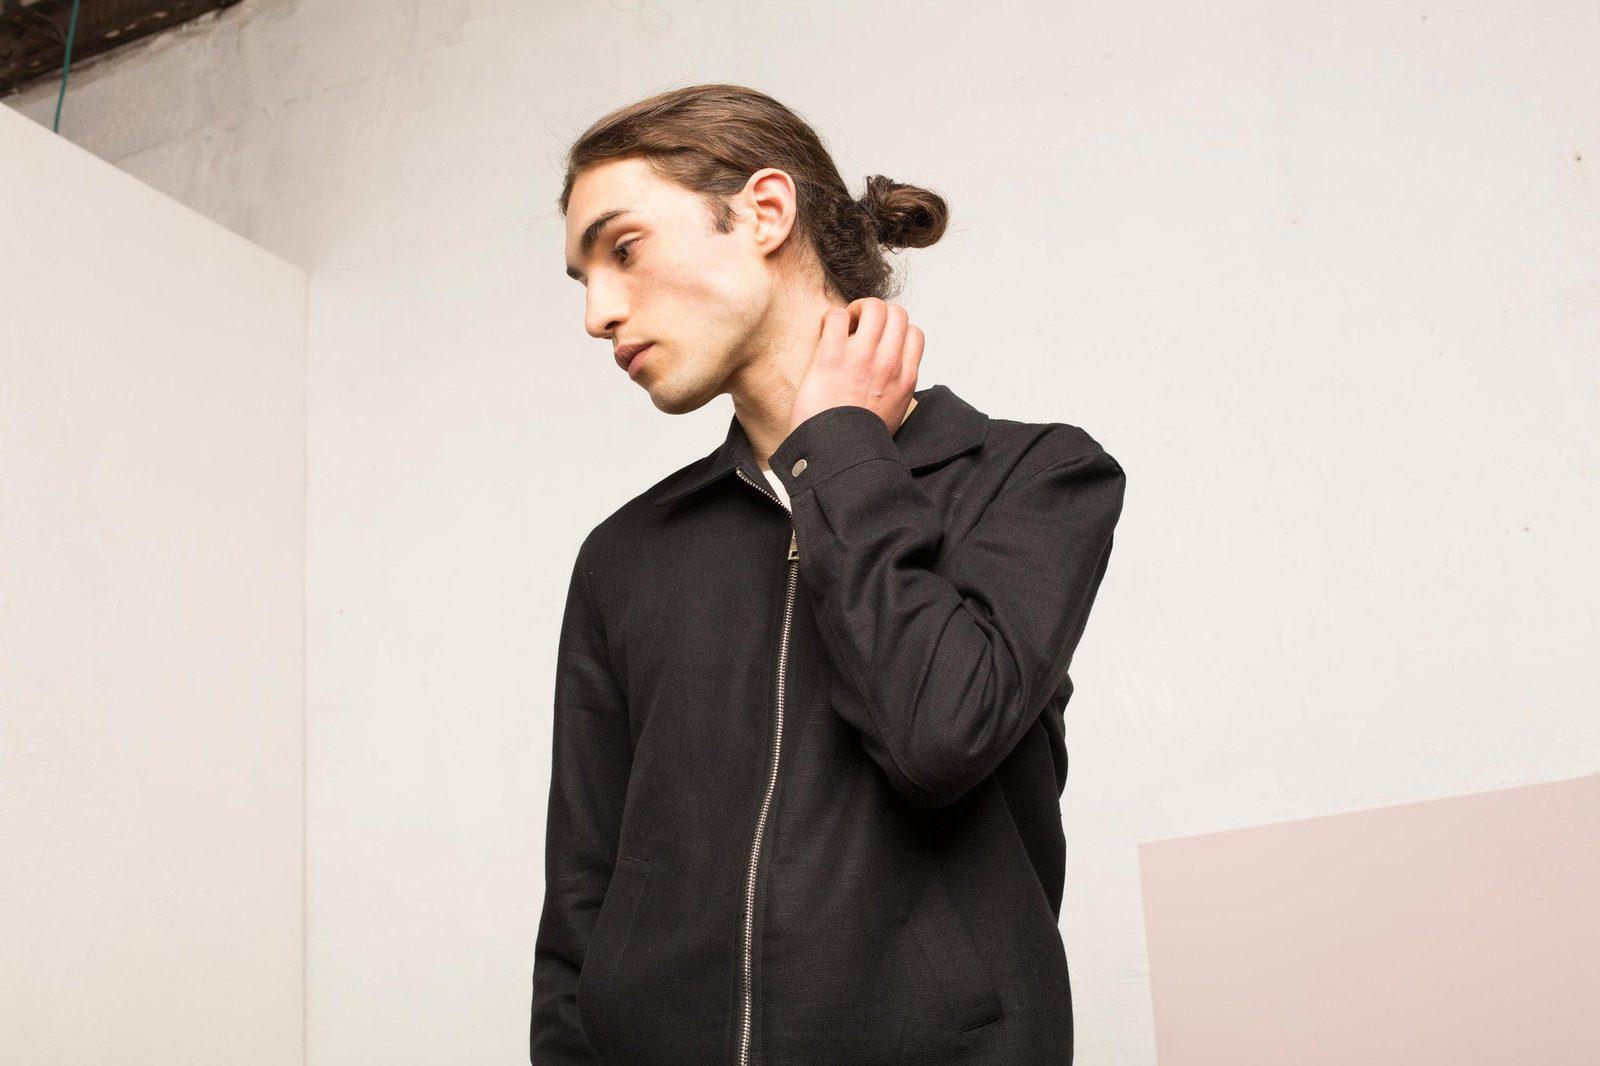 homme automne 2017 Noyoco - veste brighton noire homme close_up_2